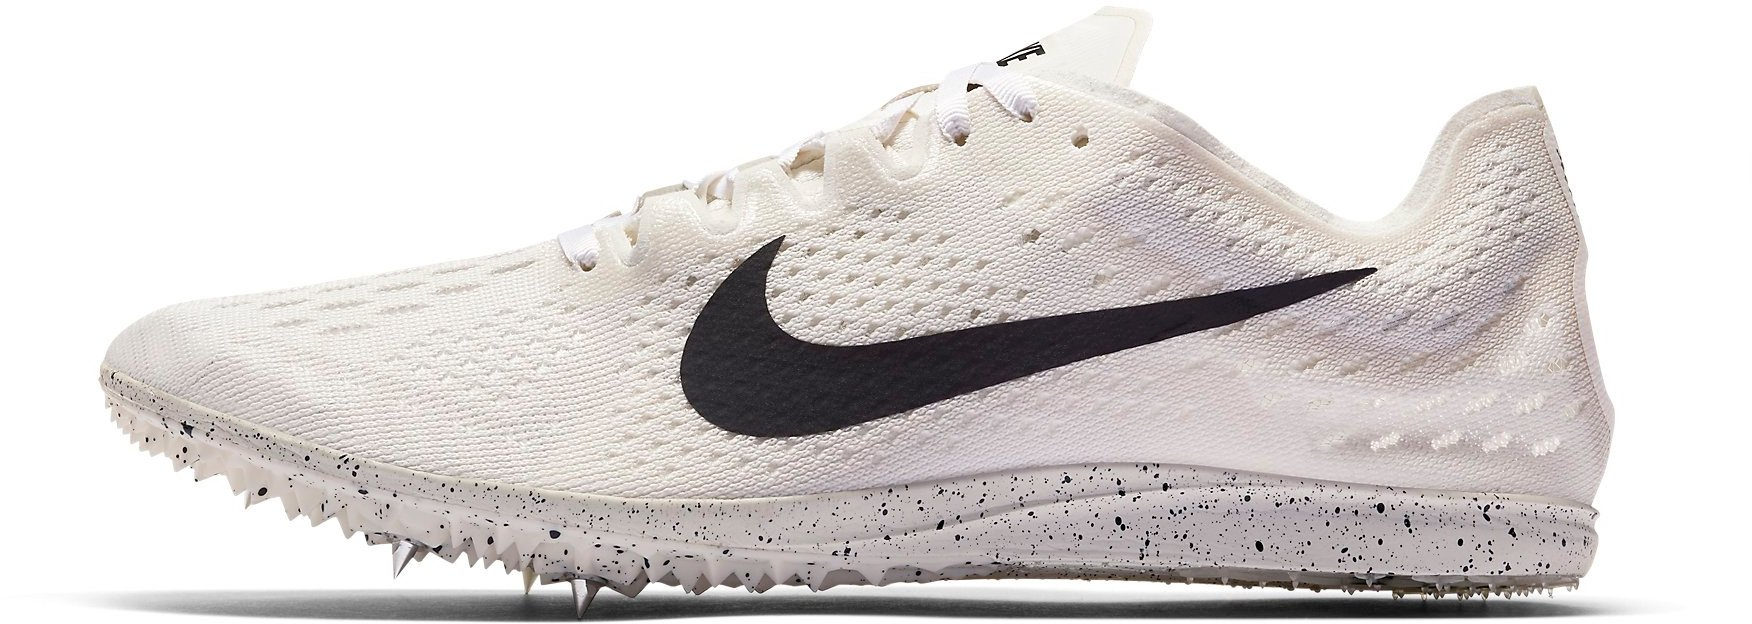 Track shoes/Spikes Nike ZOOM MATUMBO 3